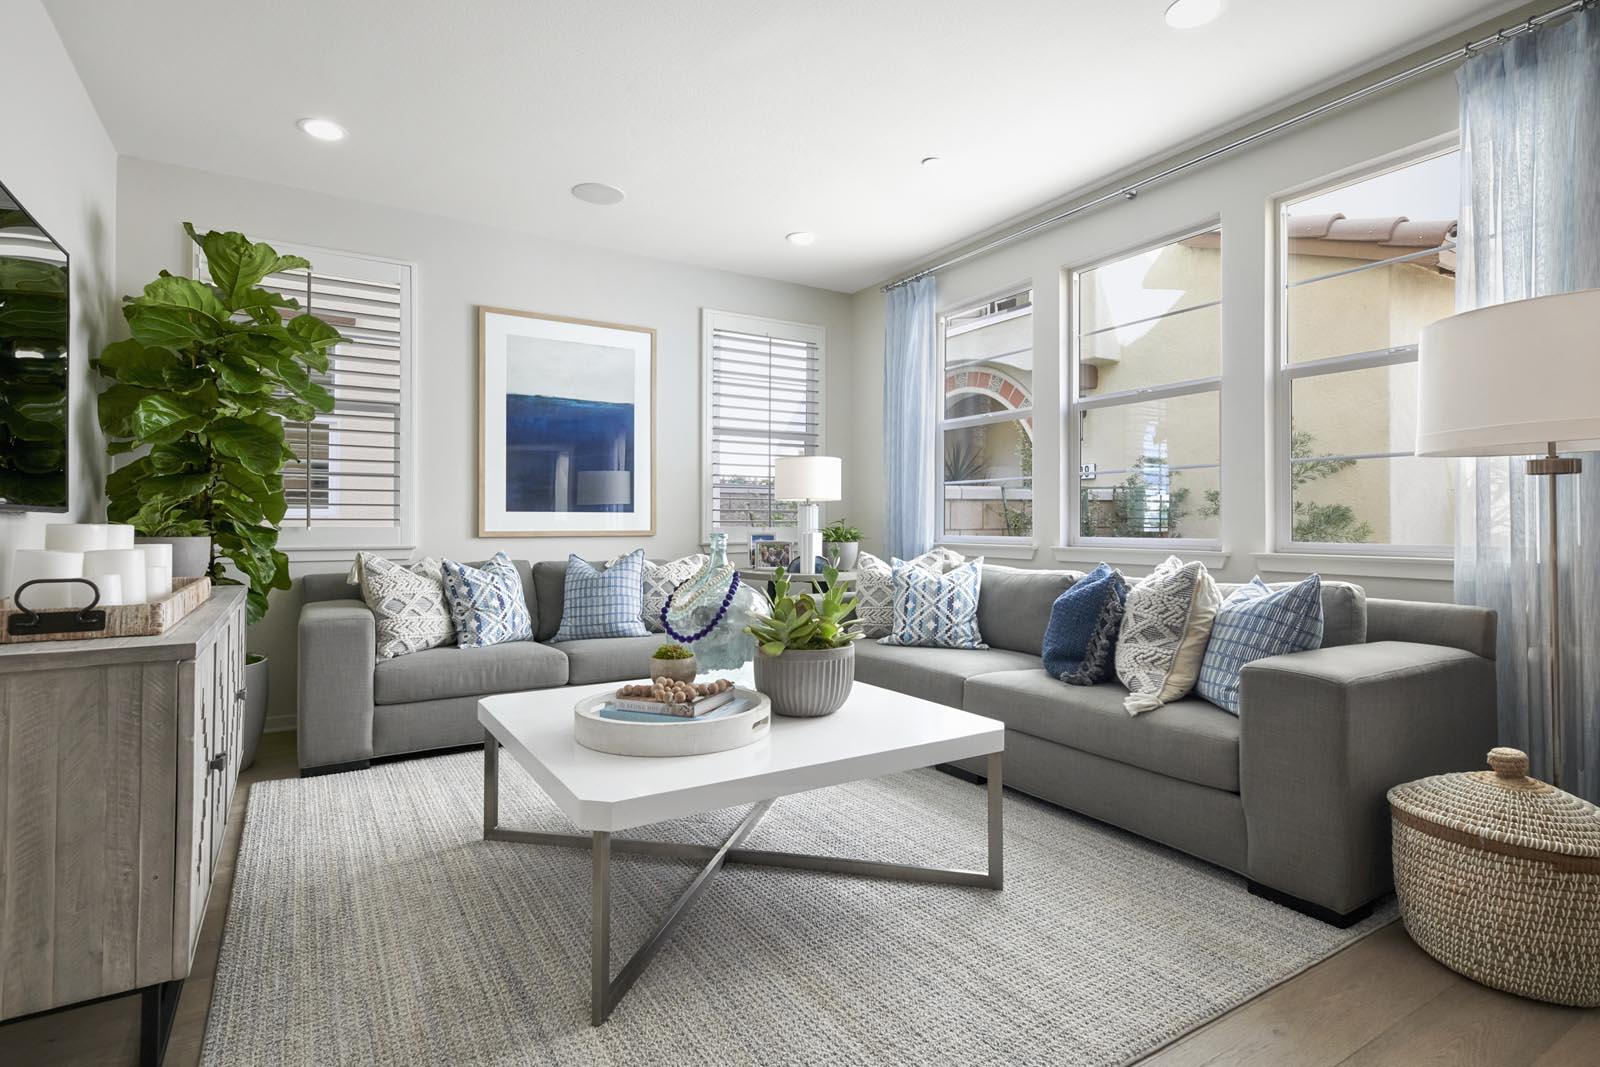 Great Room | Residence 3 | Lumin | New Homes in Rancho Cucamonga, CA | Van Daele Homes